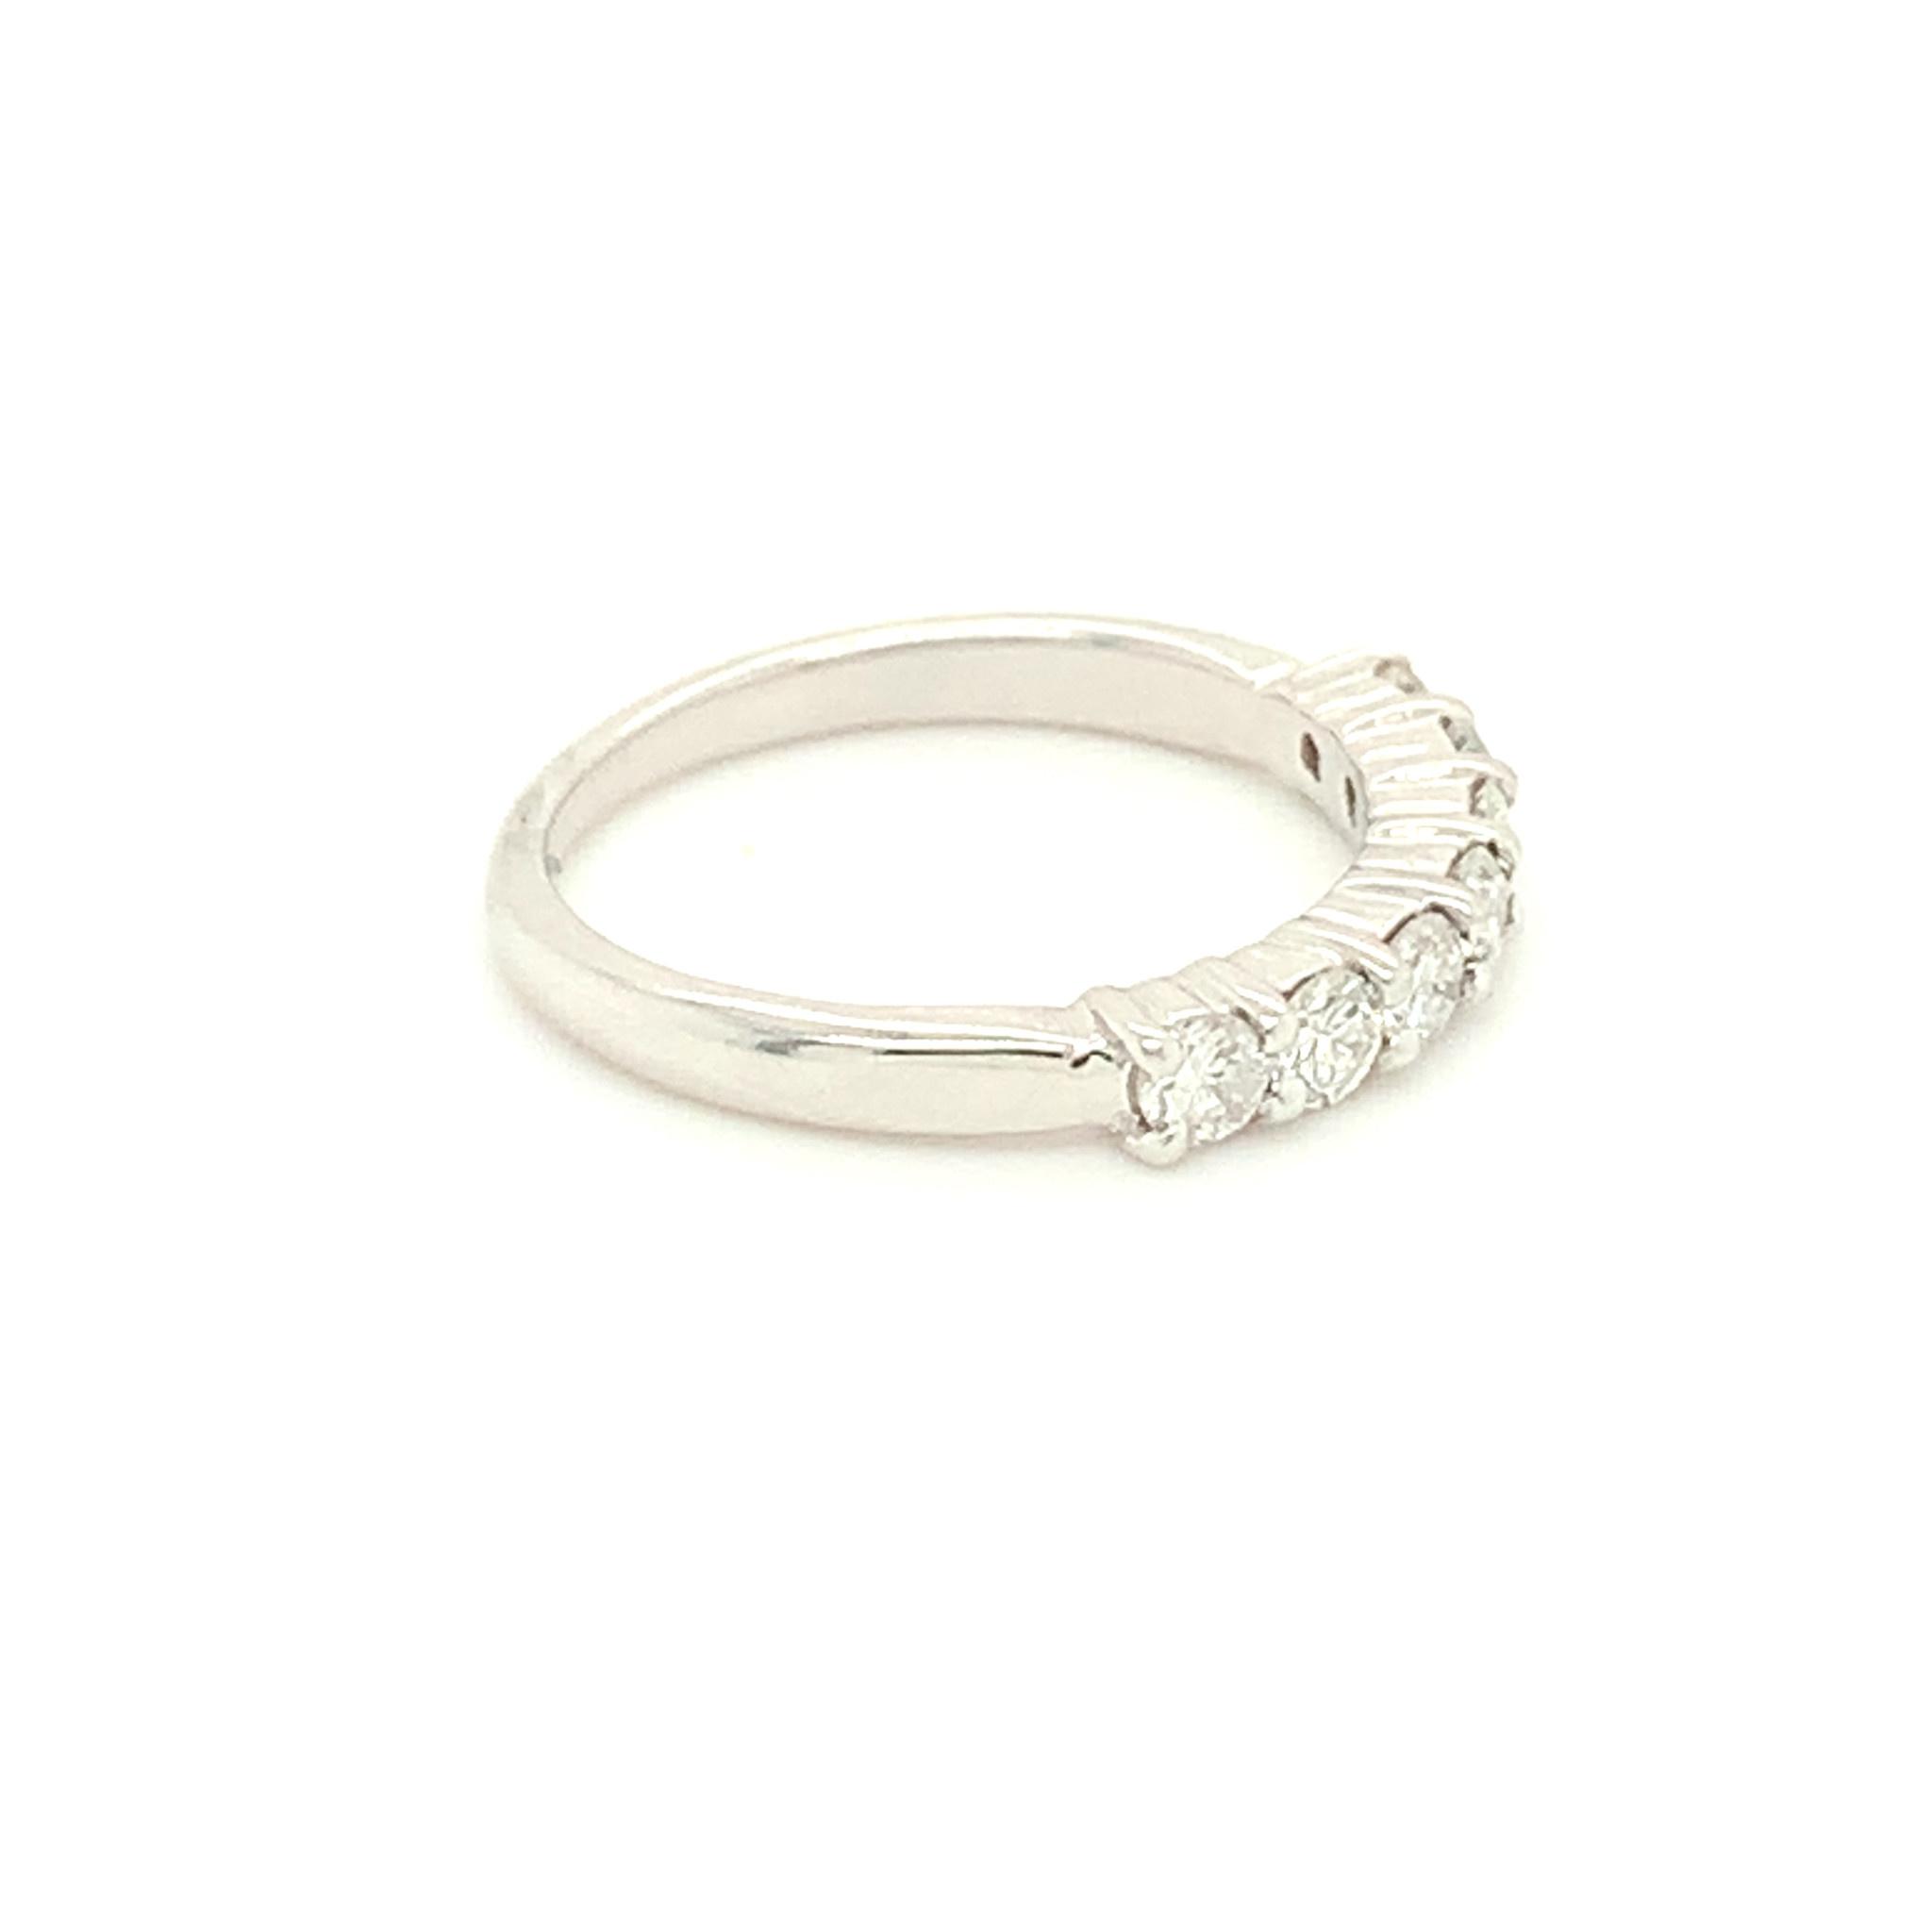 Freedman 14kt White Gold Shared Prong Diamond Band 0.64 carat total